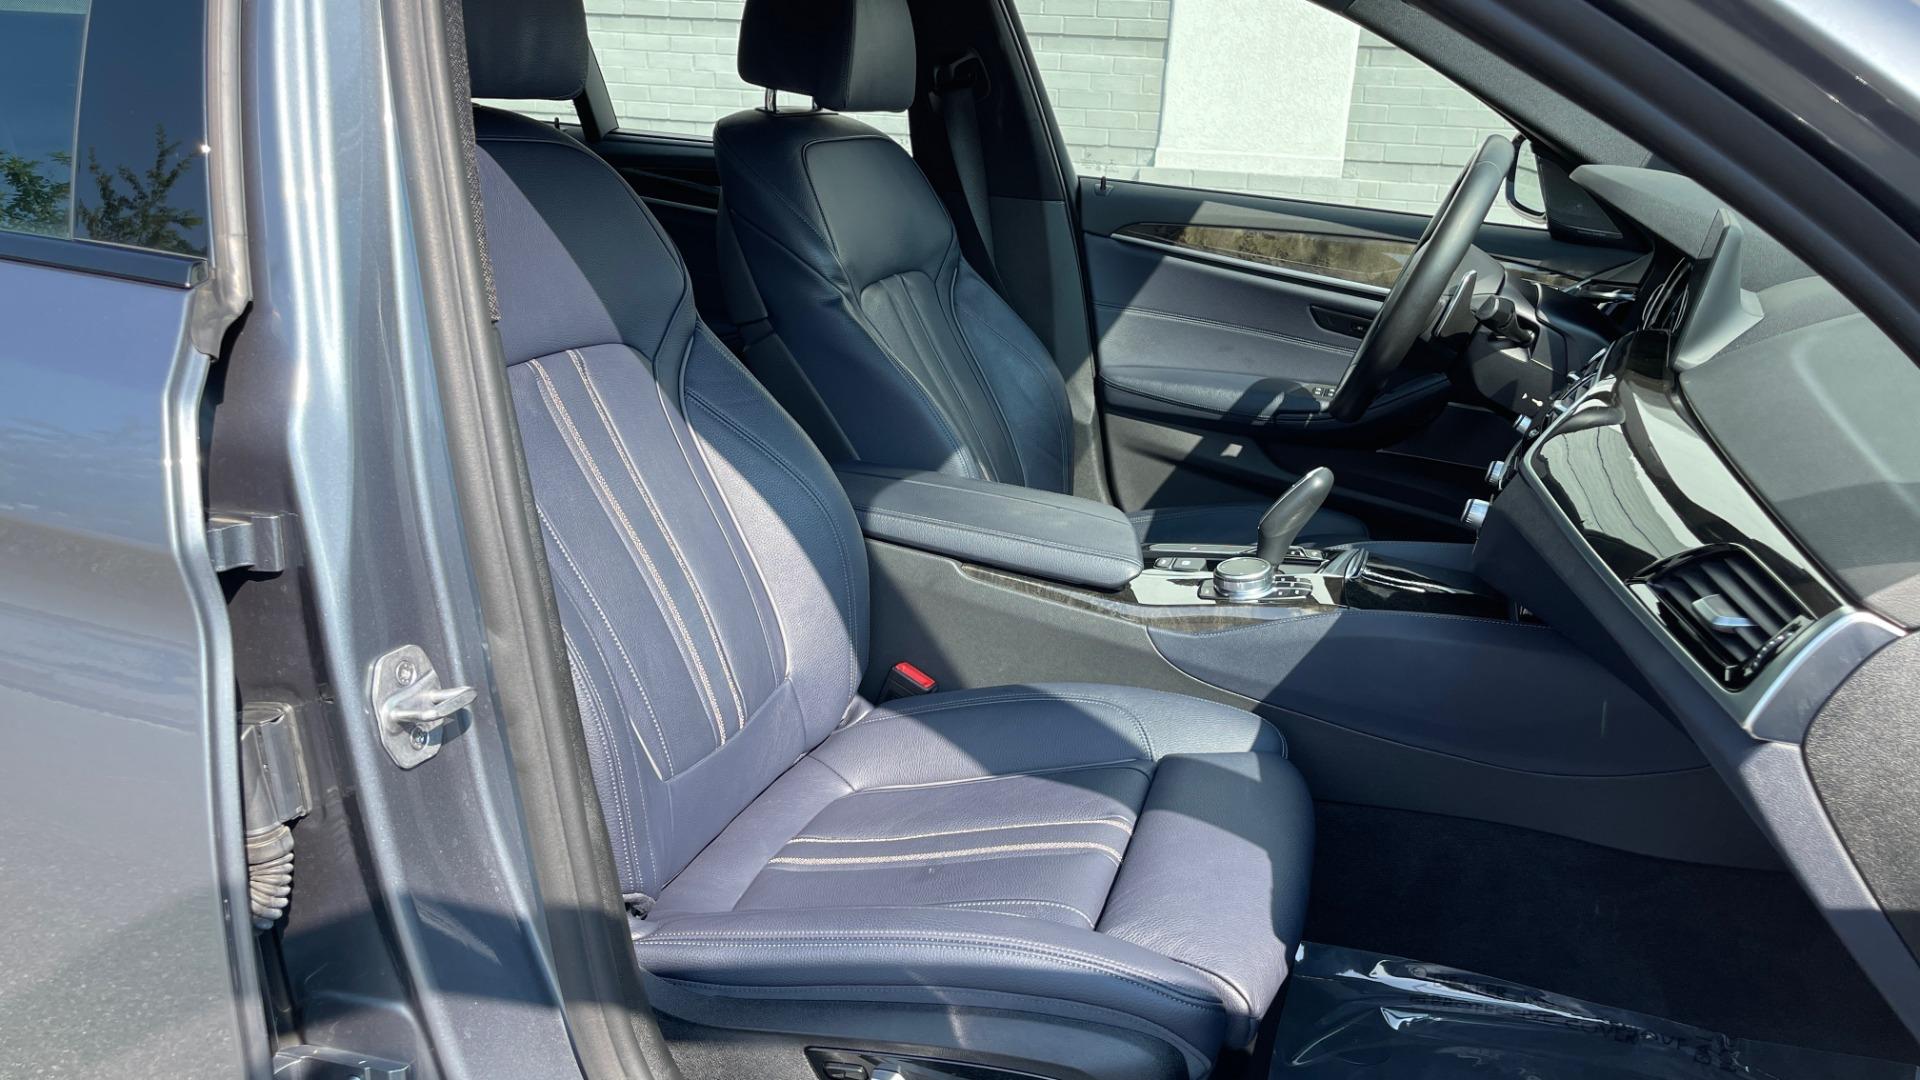 Used 2018 BMW 5 SERIES 540I XDRIVE M-SPORT / DRVR ASST / PDC / APPLE / HUD / H/K SND for sale $42,795 at Formula Imports in Charlotte NC 28227 68